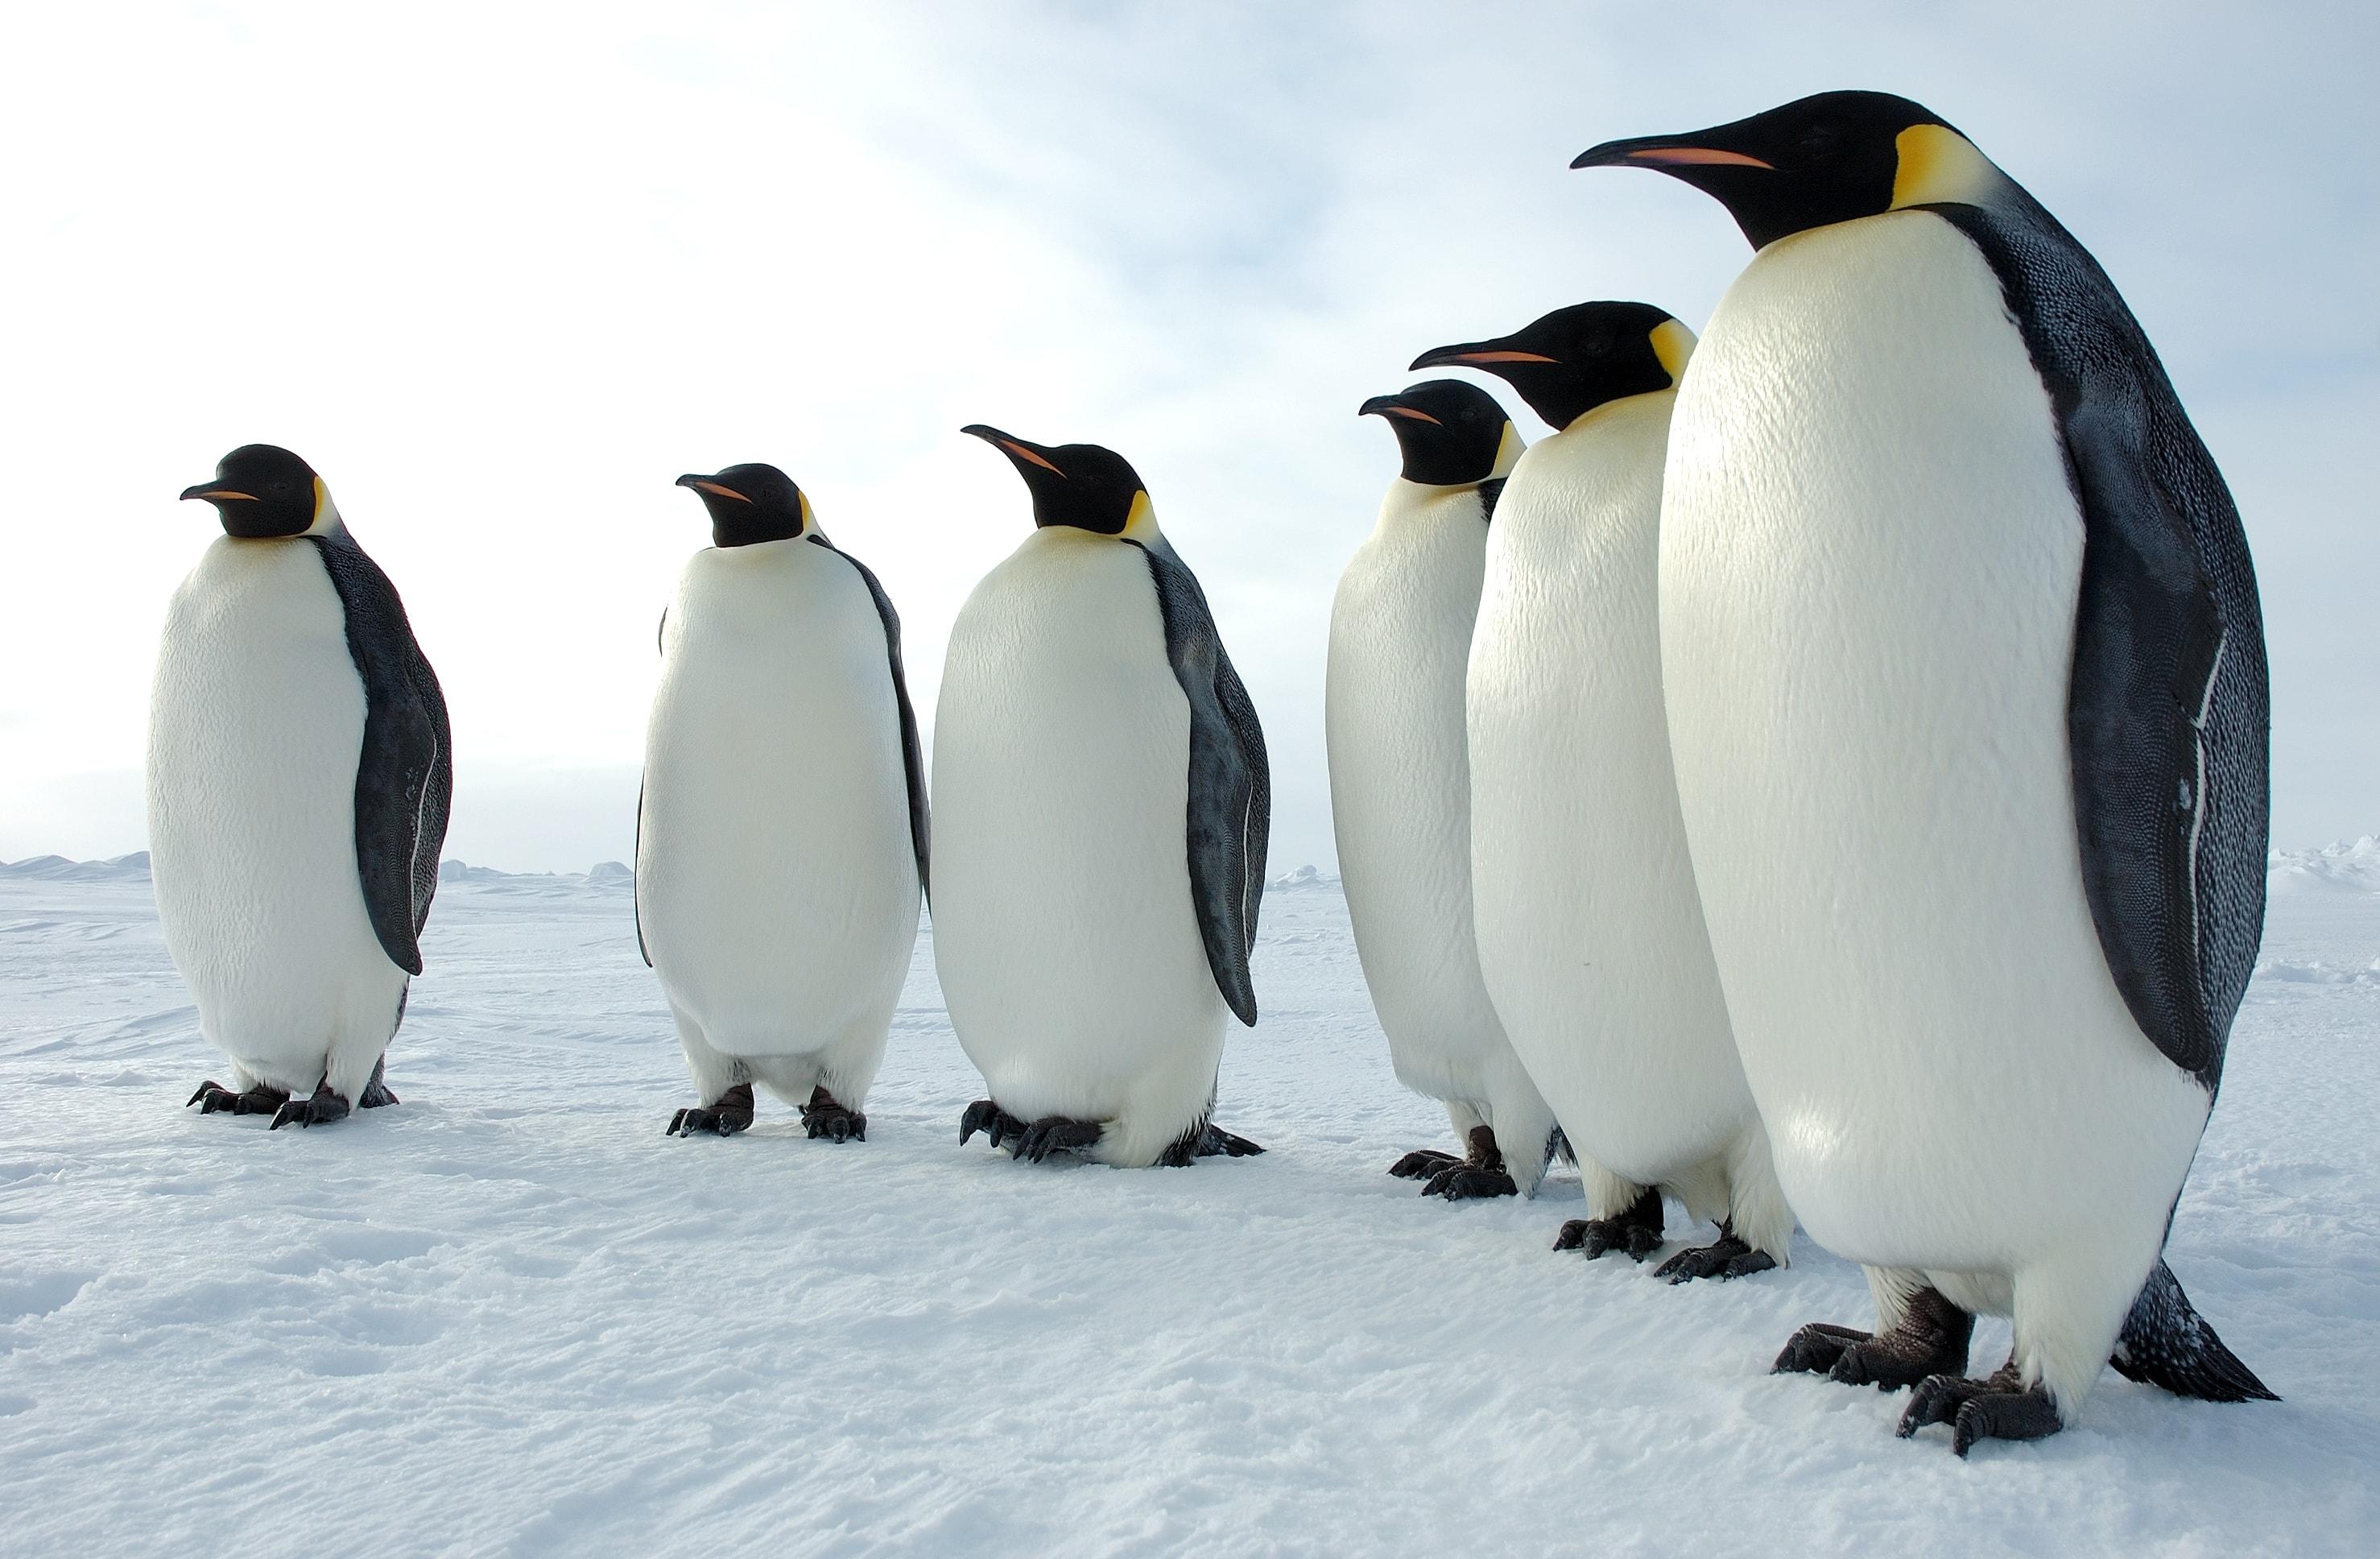 Penguin Widescreen